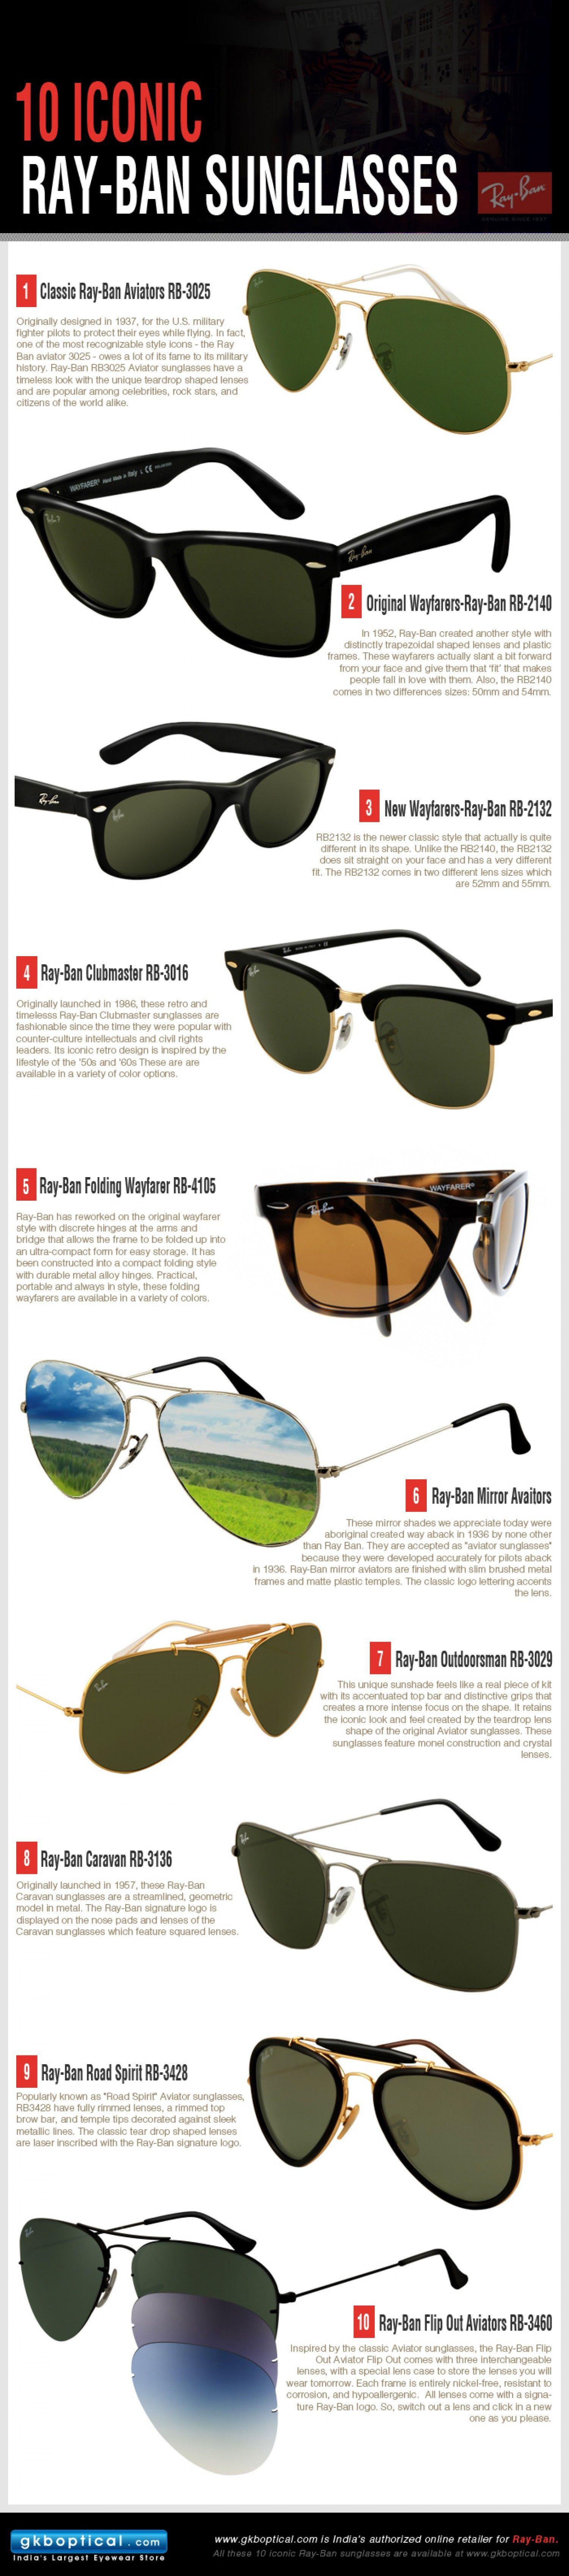 top 5 ray ban sunglasses 2019